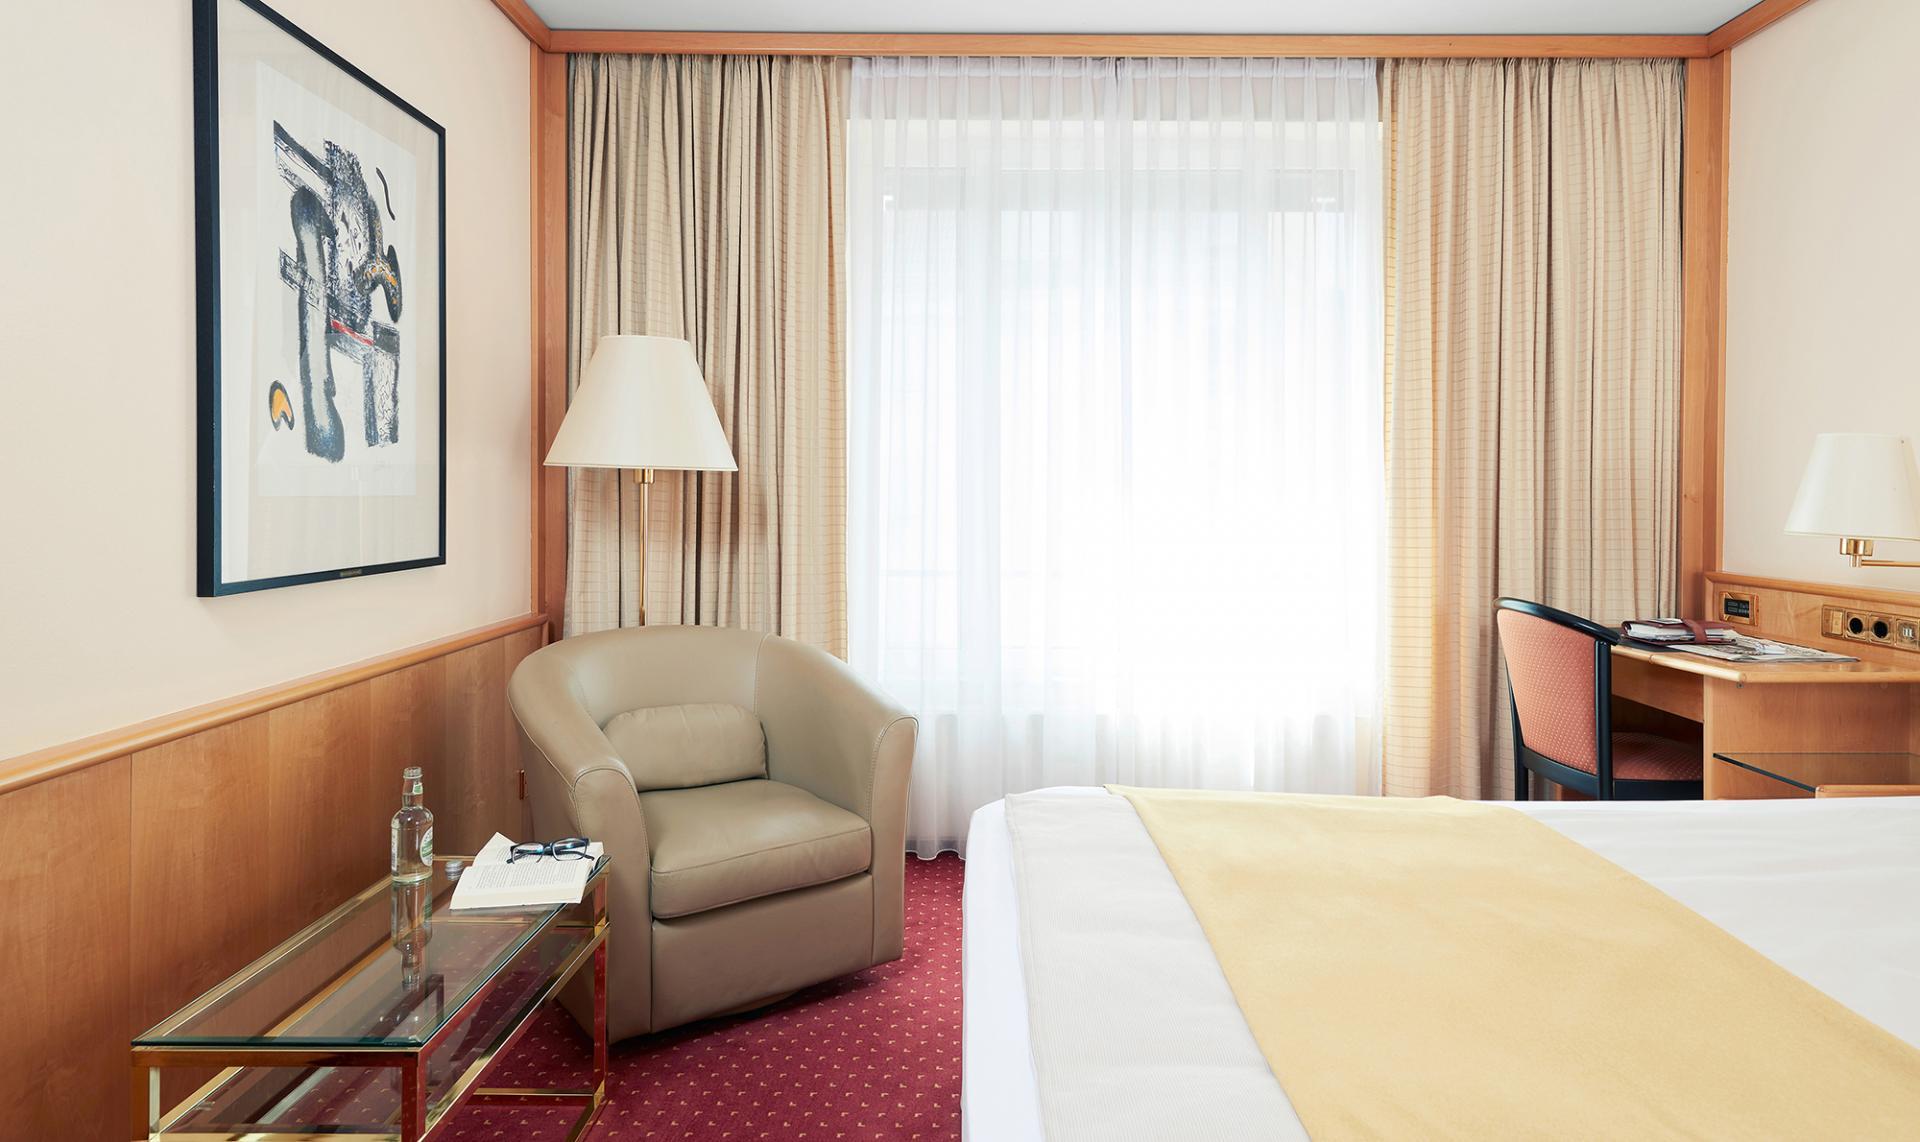 Bed at Living Hotel Grosser Kurfurst Apartments, Berlin Mitte, Berlin